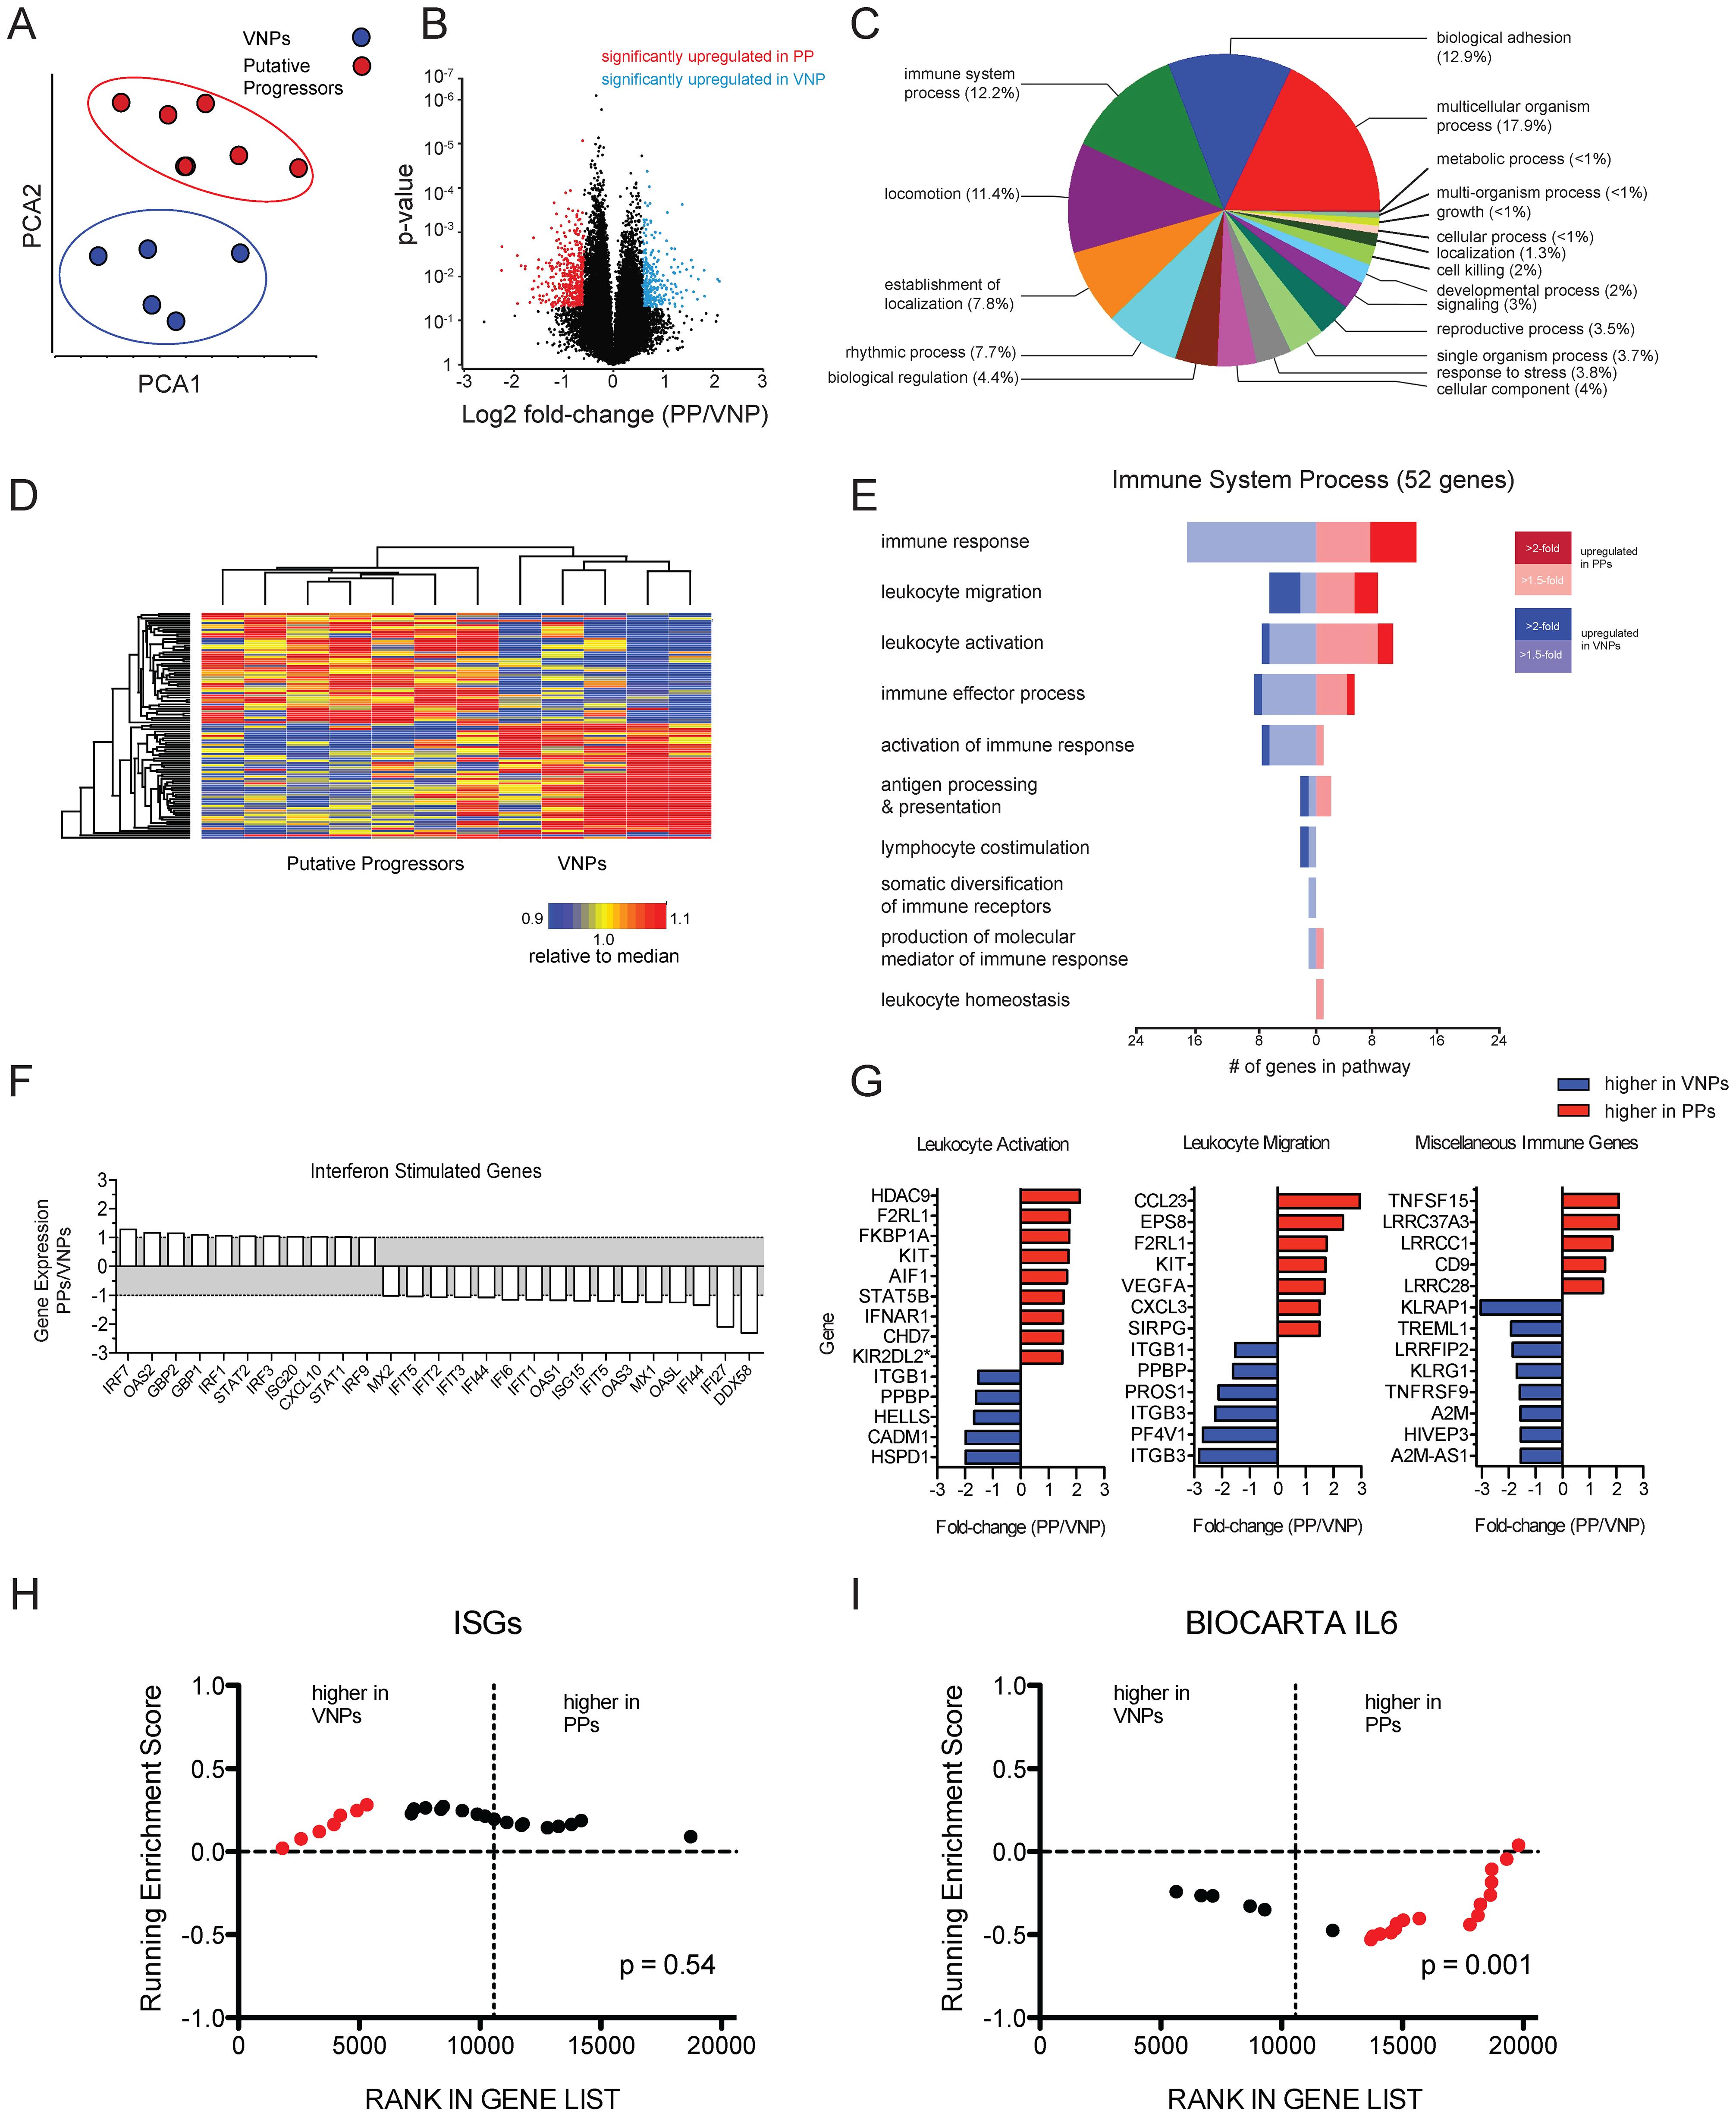 Transcriptomic signatures between HIV-infected putative progressors and viremic non-progressors.